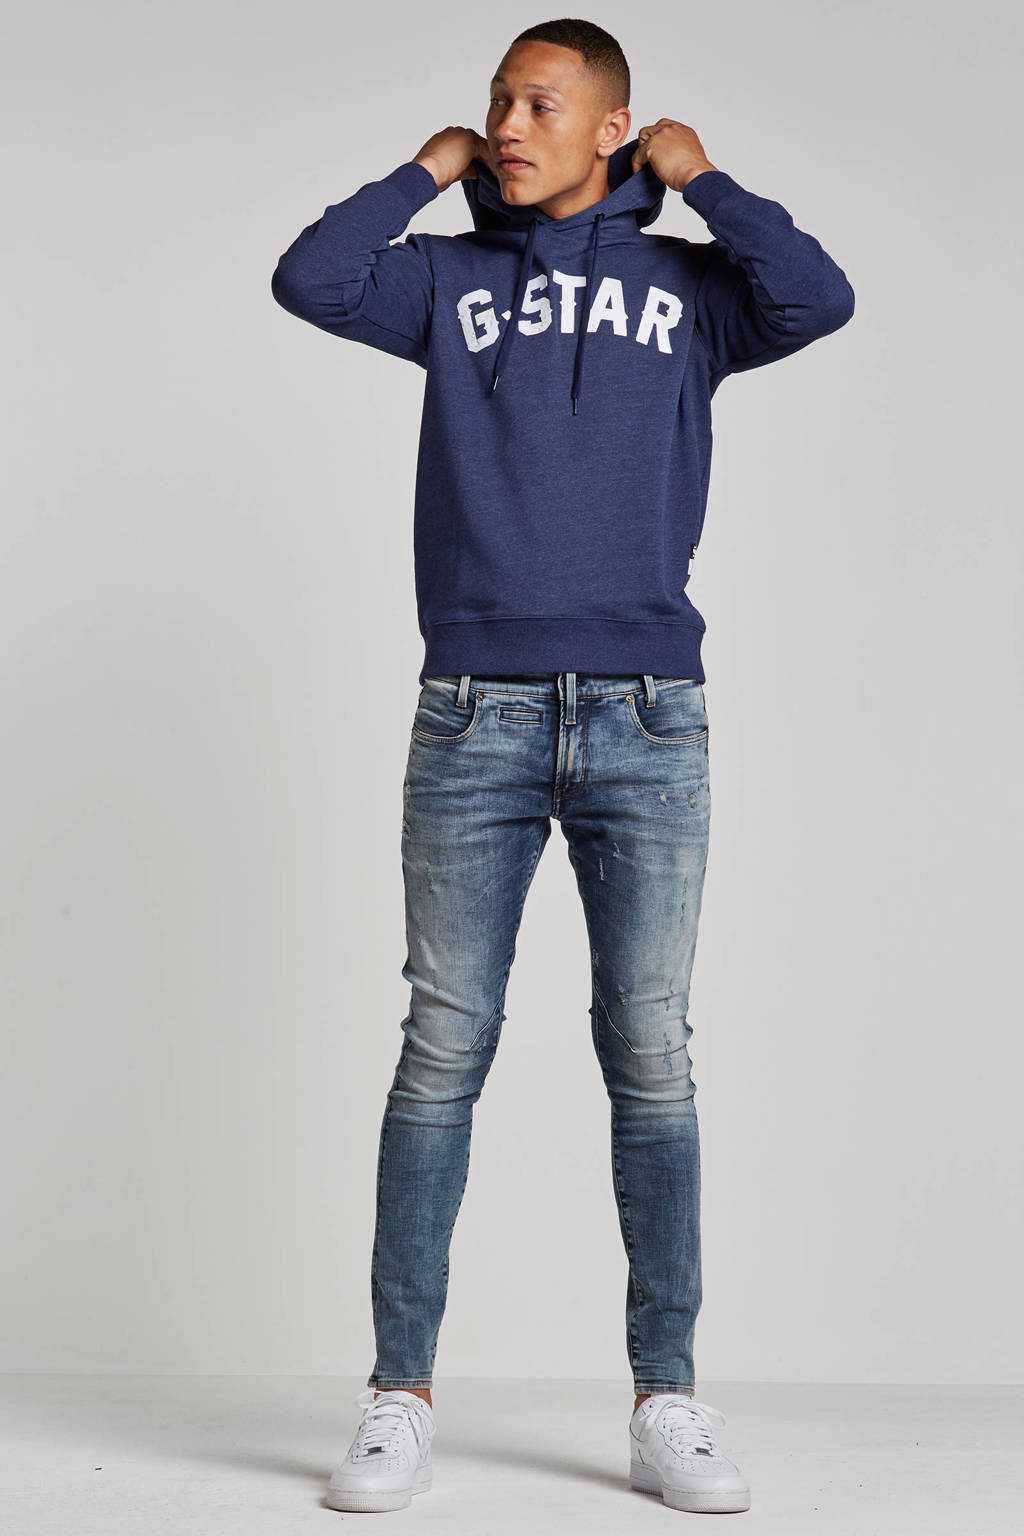 G-Star RAW skinny fit jeans D-Staq, Vintage medium aged small destroy